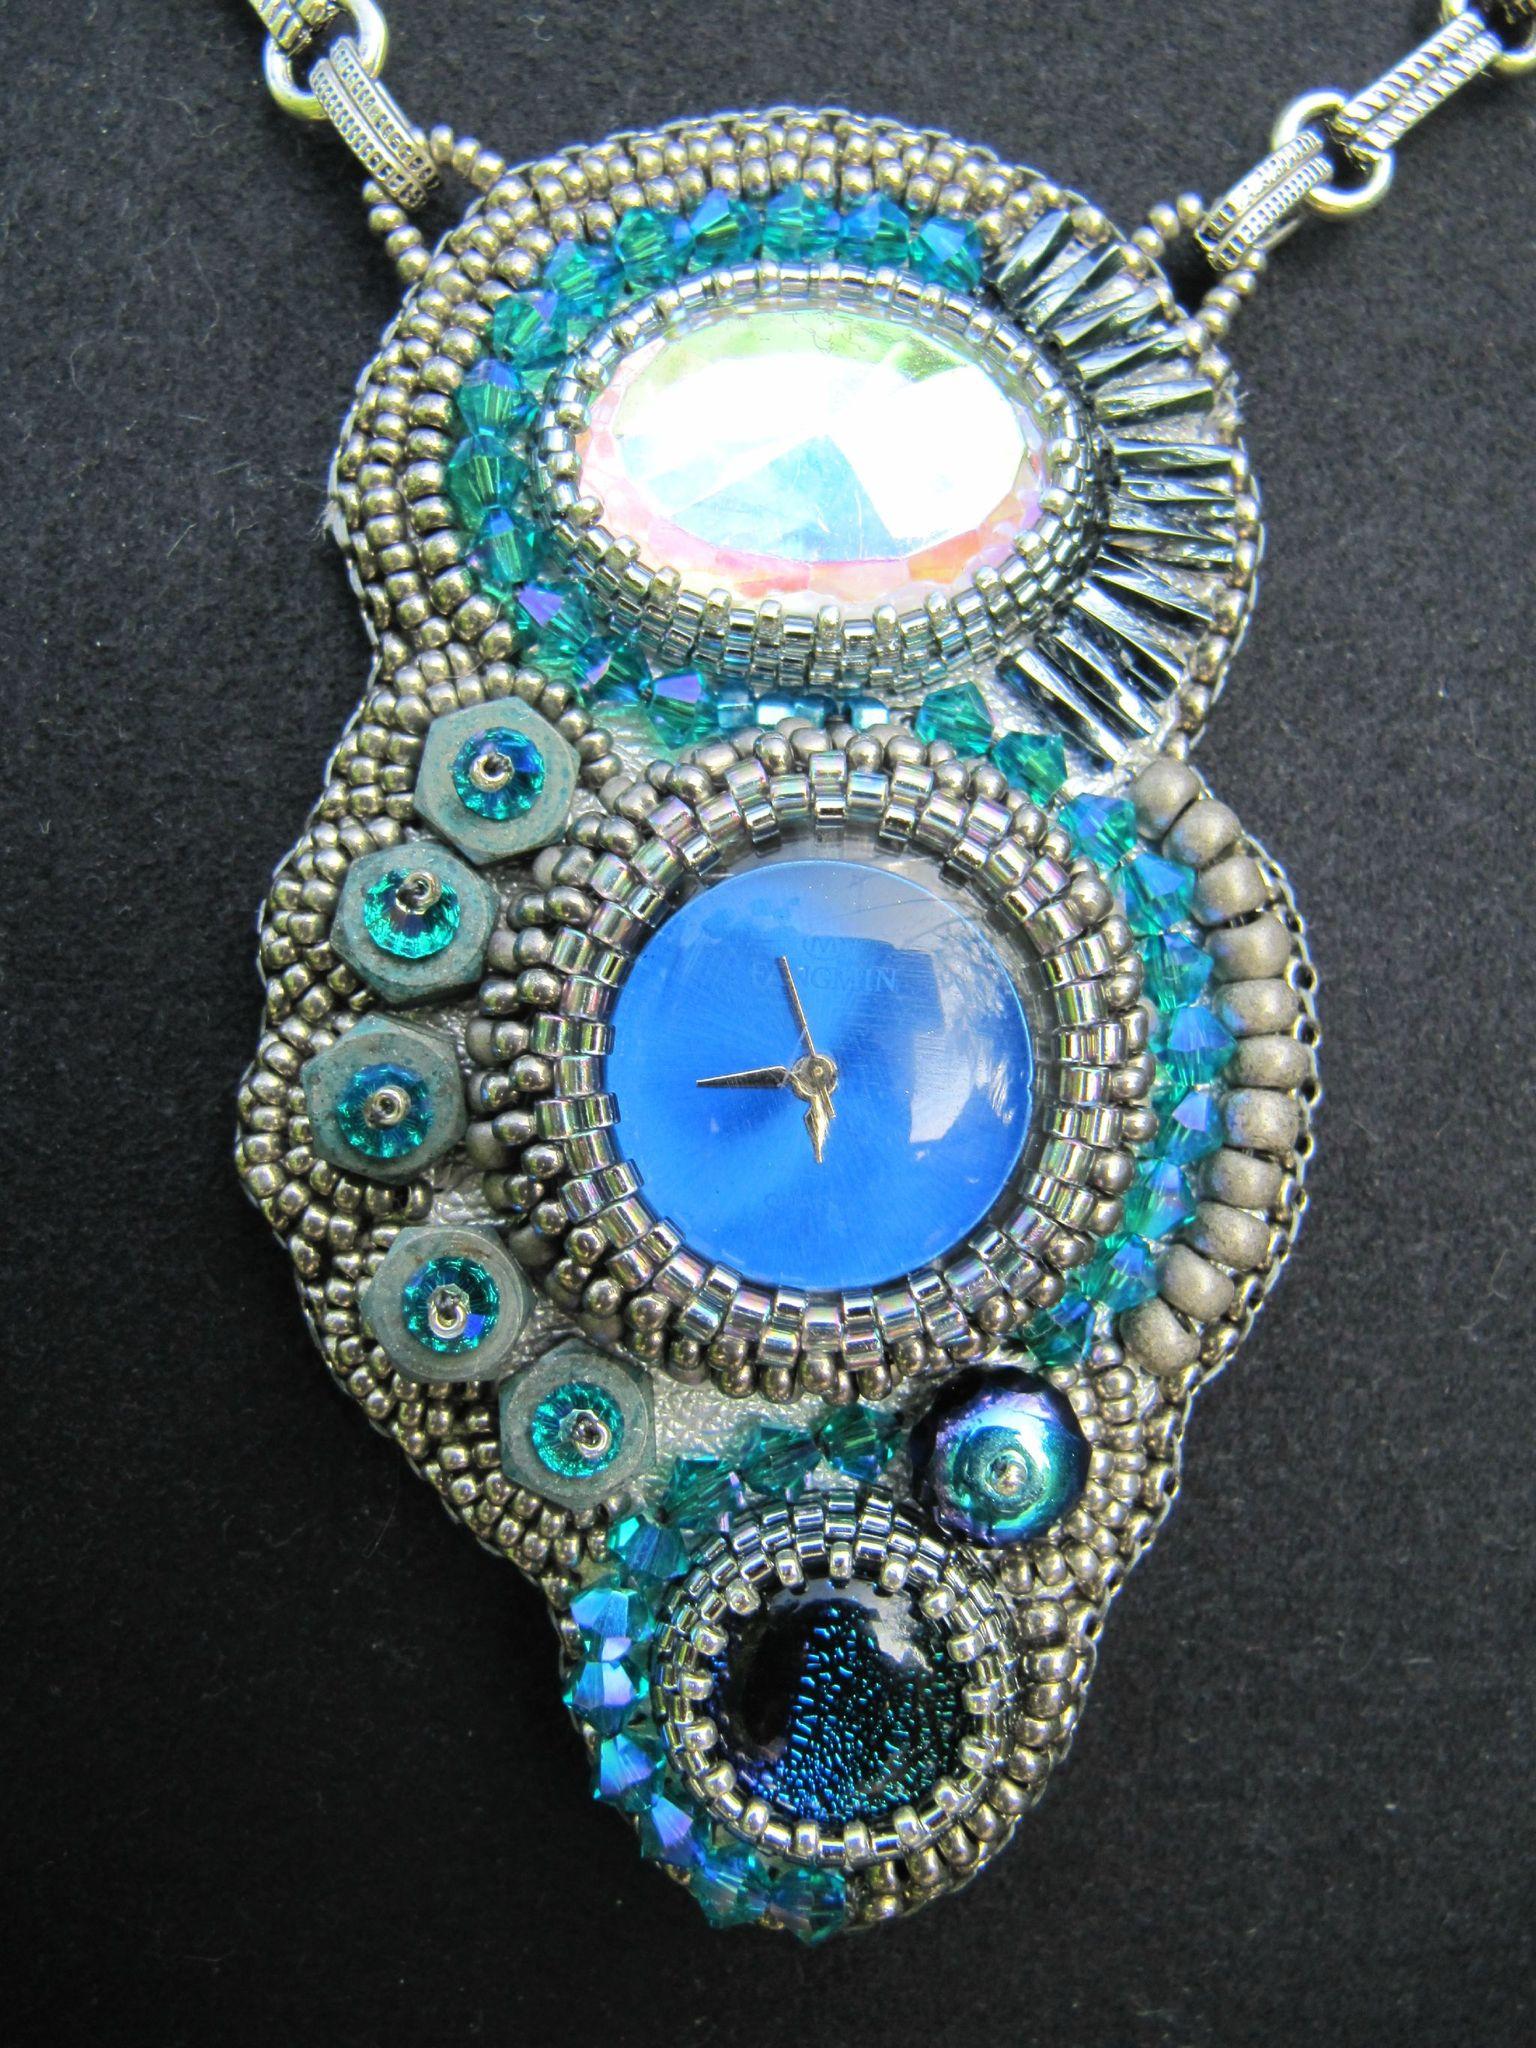 pendentif Temps Modernes bleu turquoise